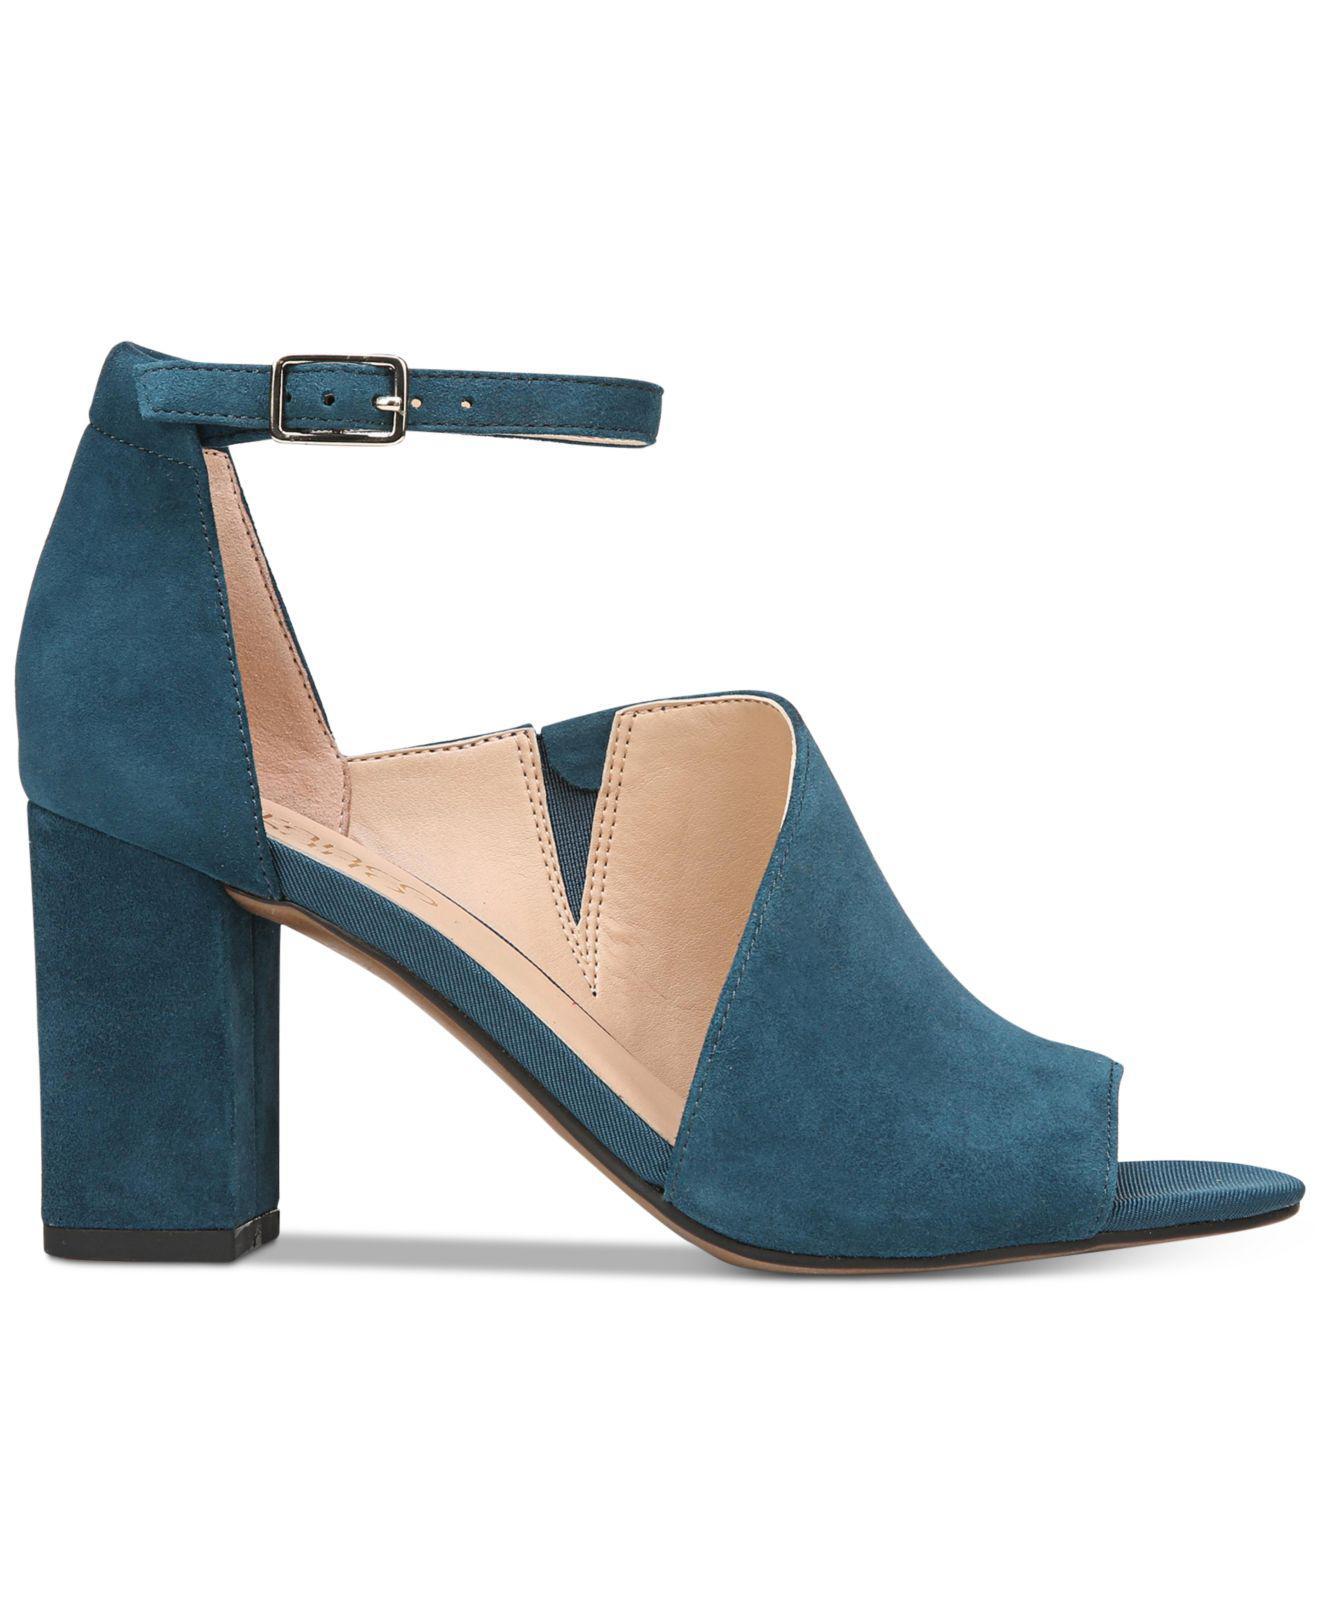 0bc26e4087 Franco Sarto Gayle Block-heel Dress Sandals in Blue - Lyst